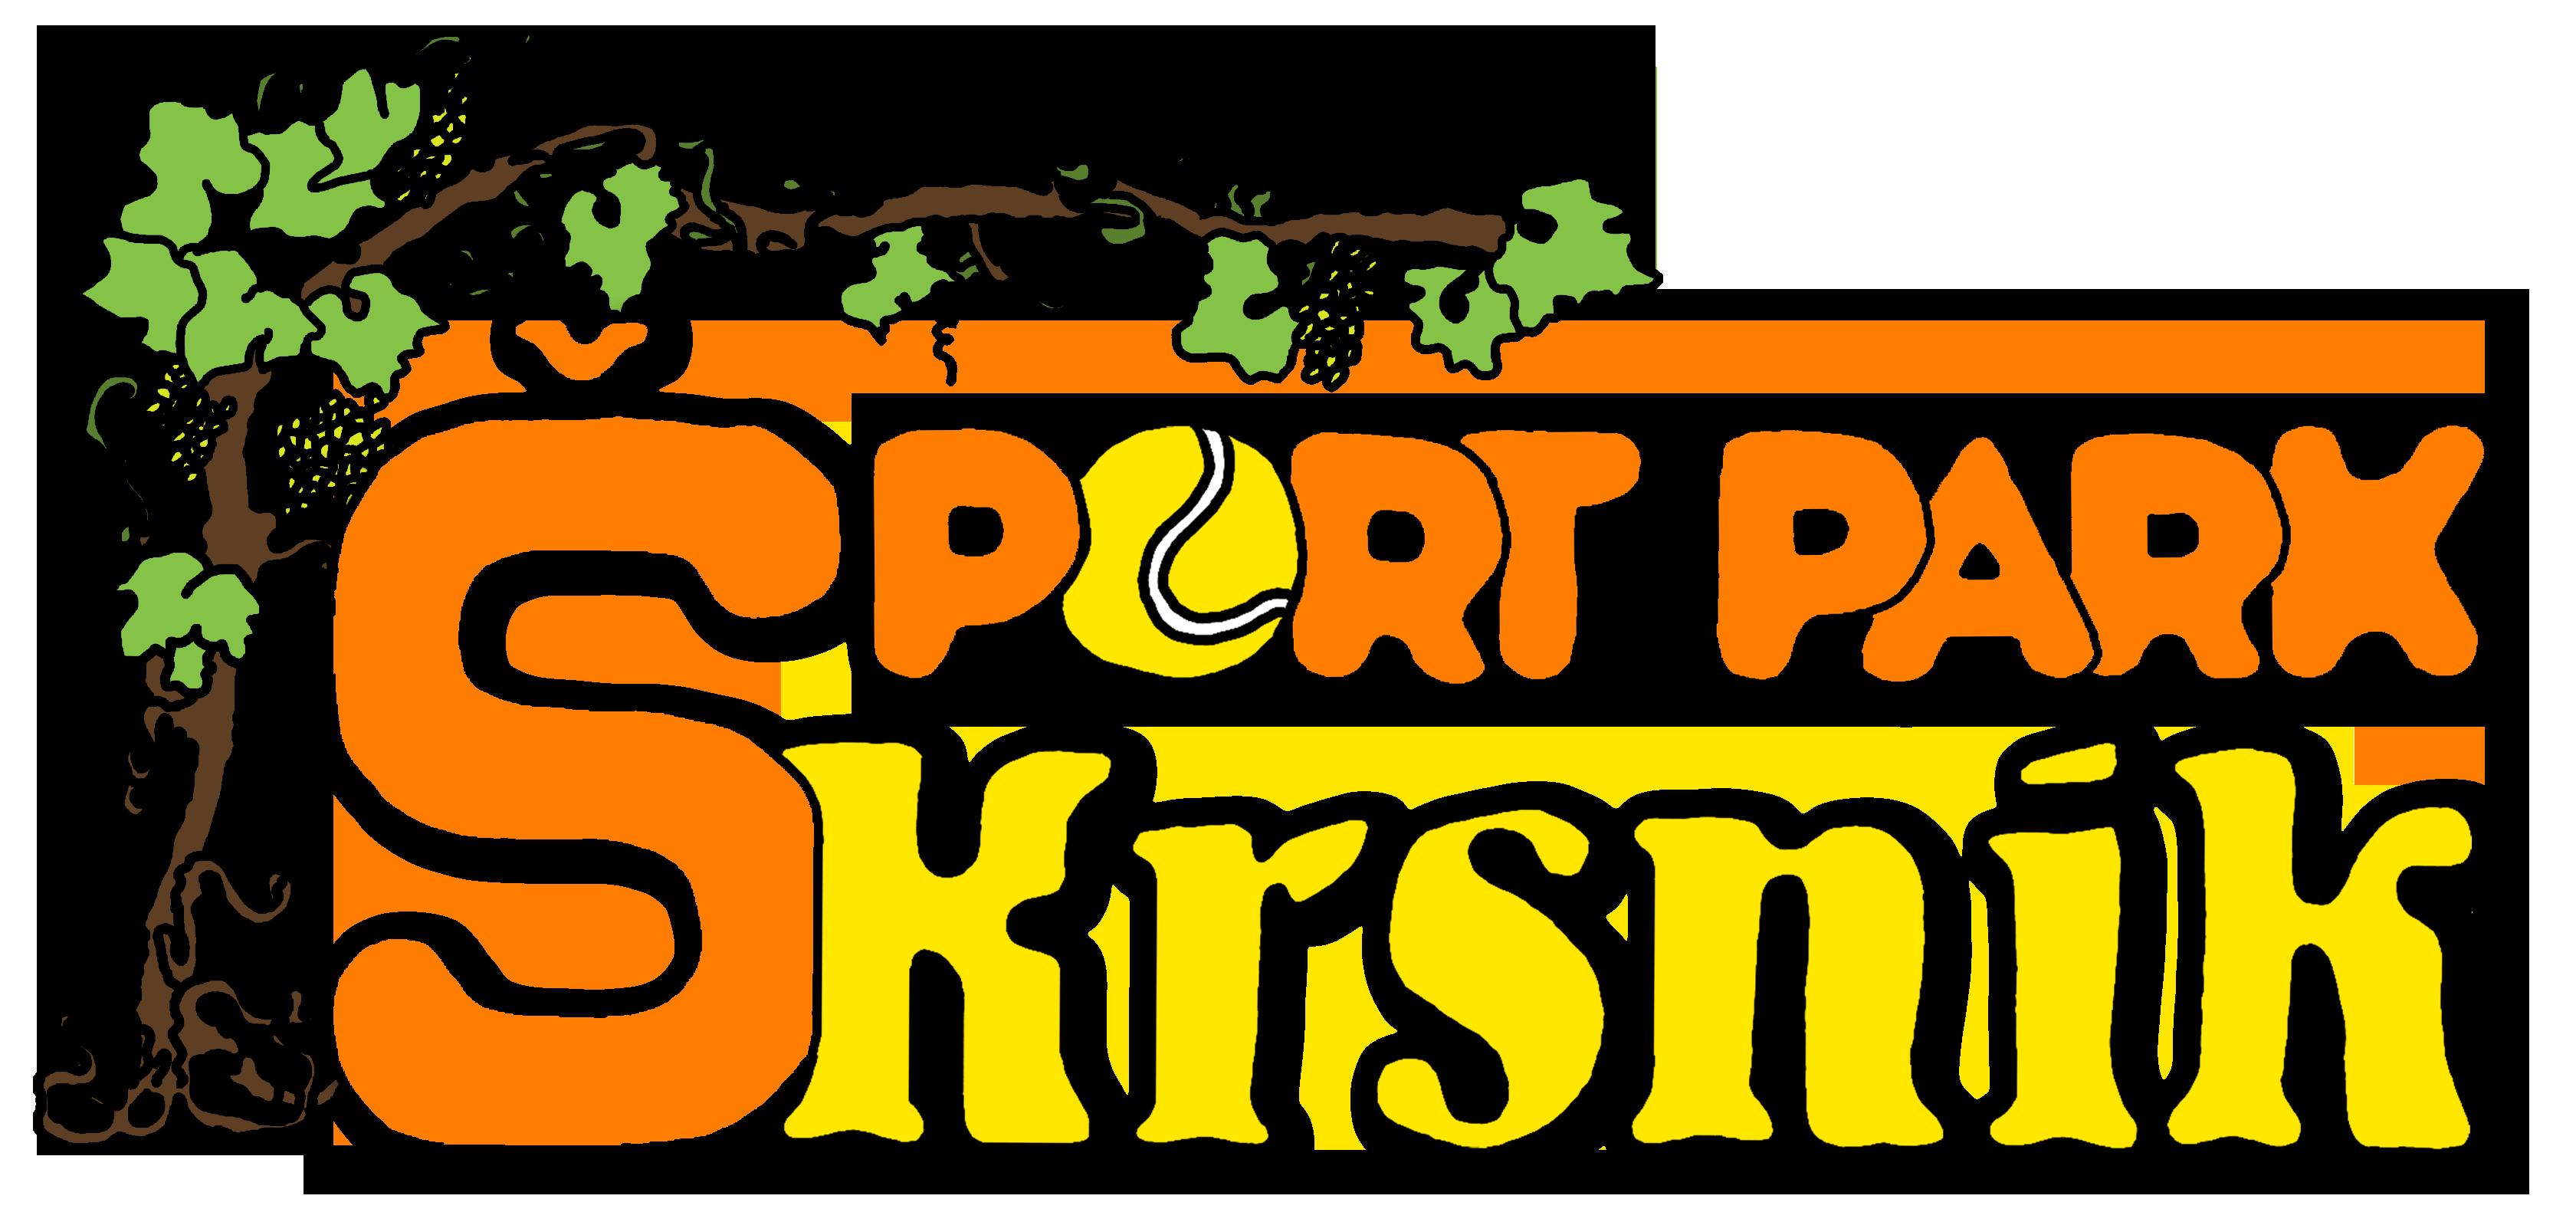 Šport park Krsnik